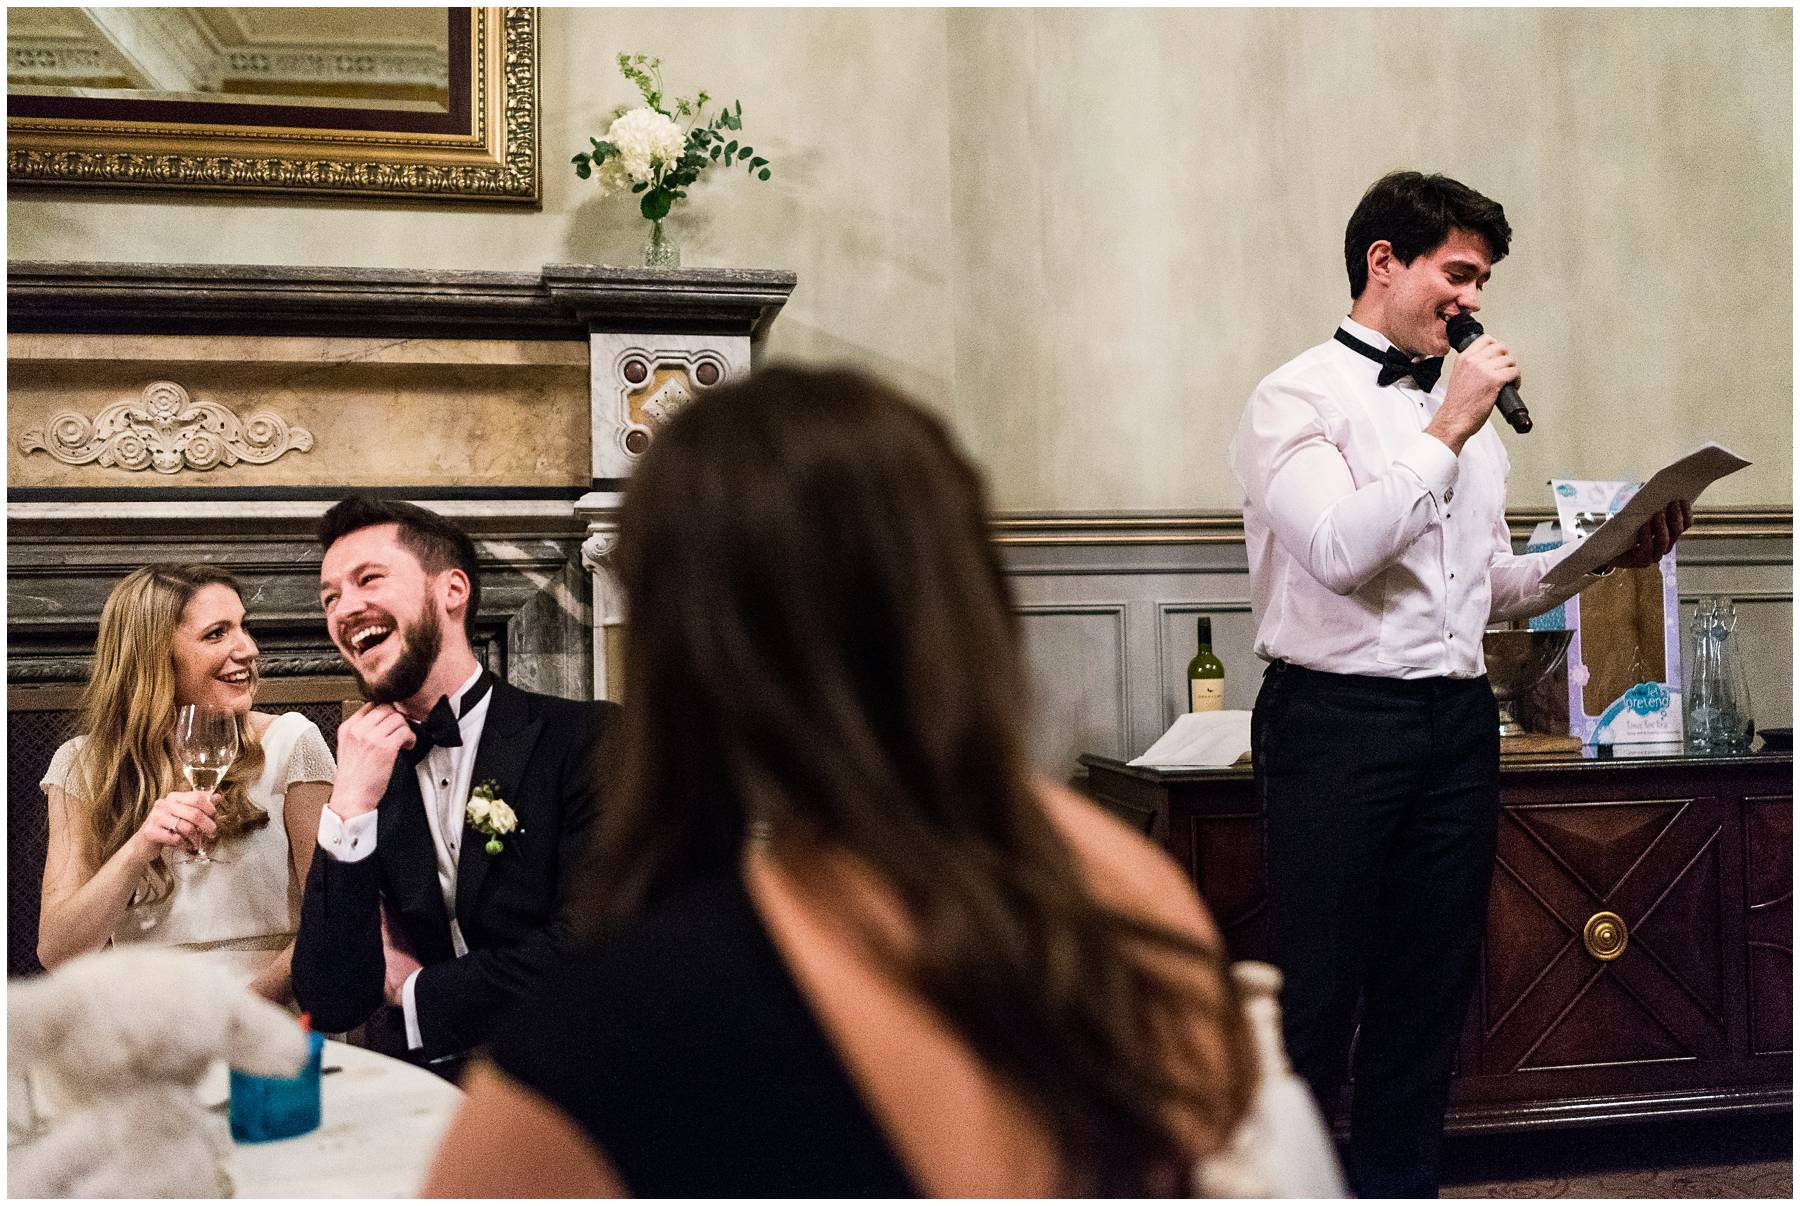 Wedding speeches at St Pancras Renaissance Hotel